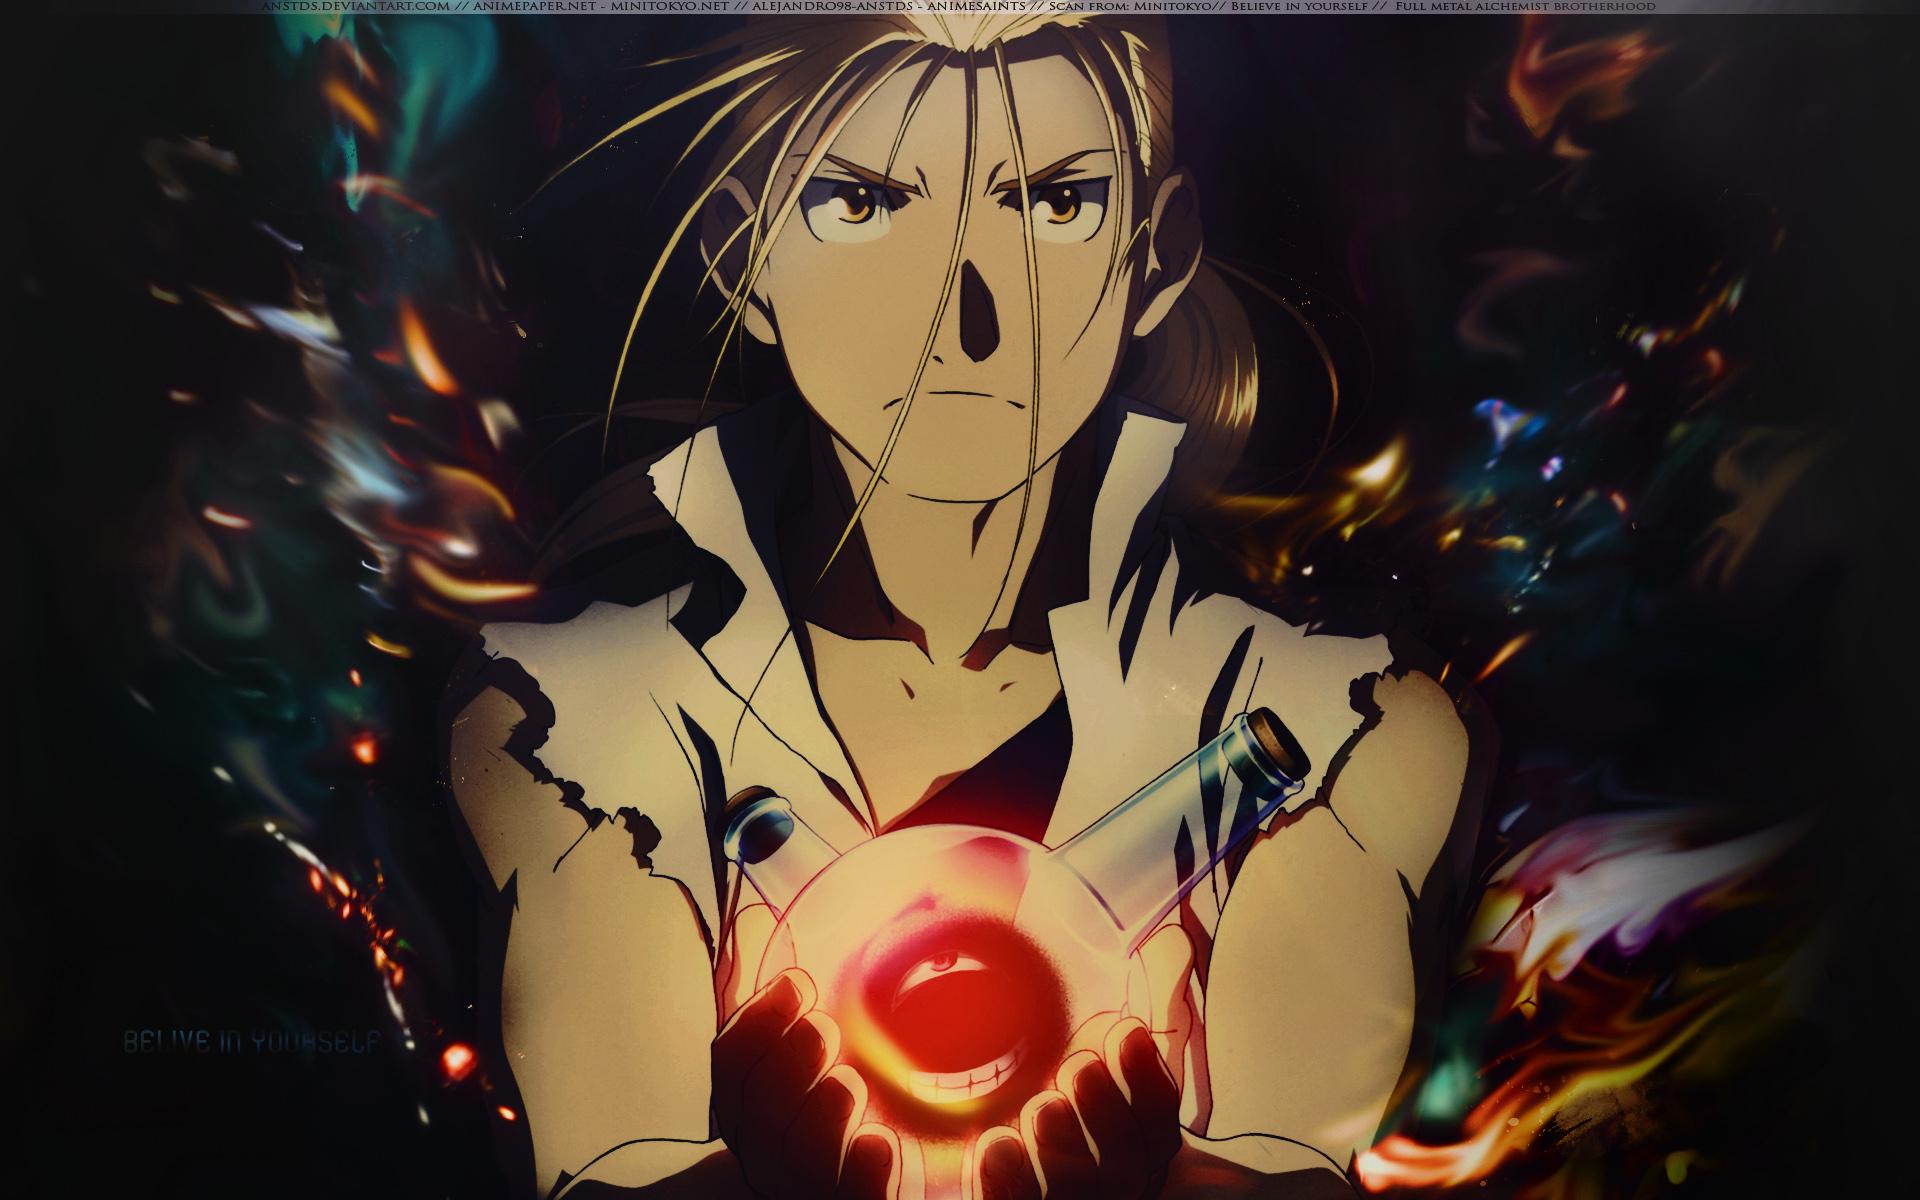 manga fullmetal alchemist wallpapers - photo #46